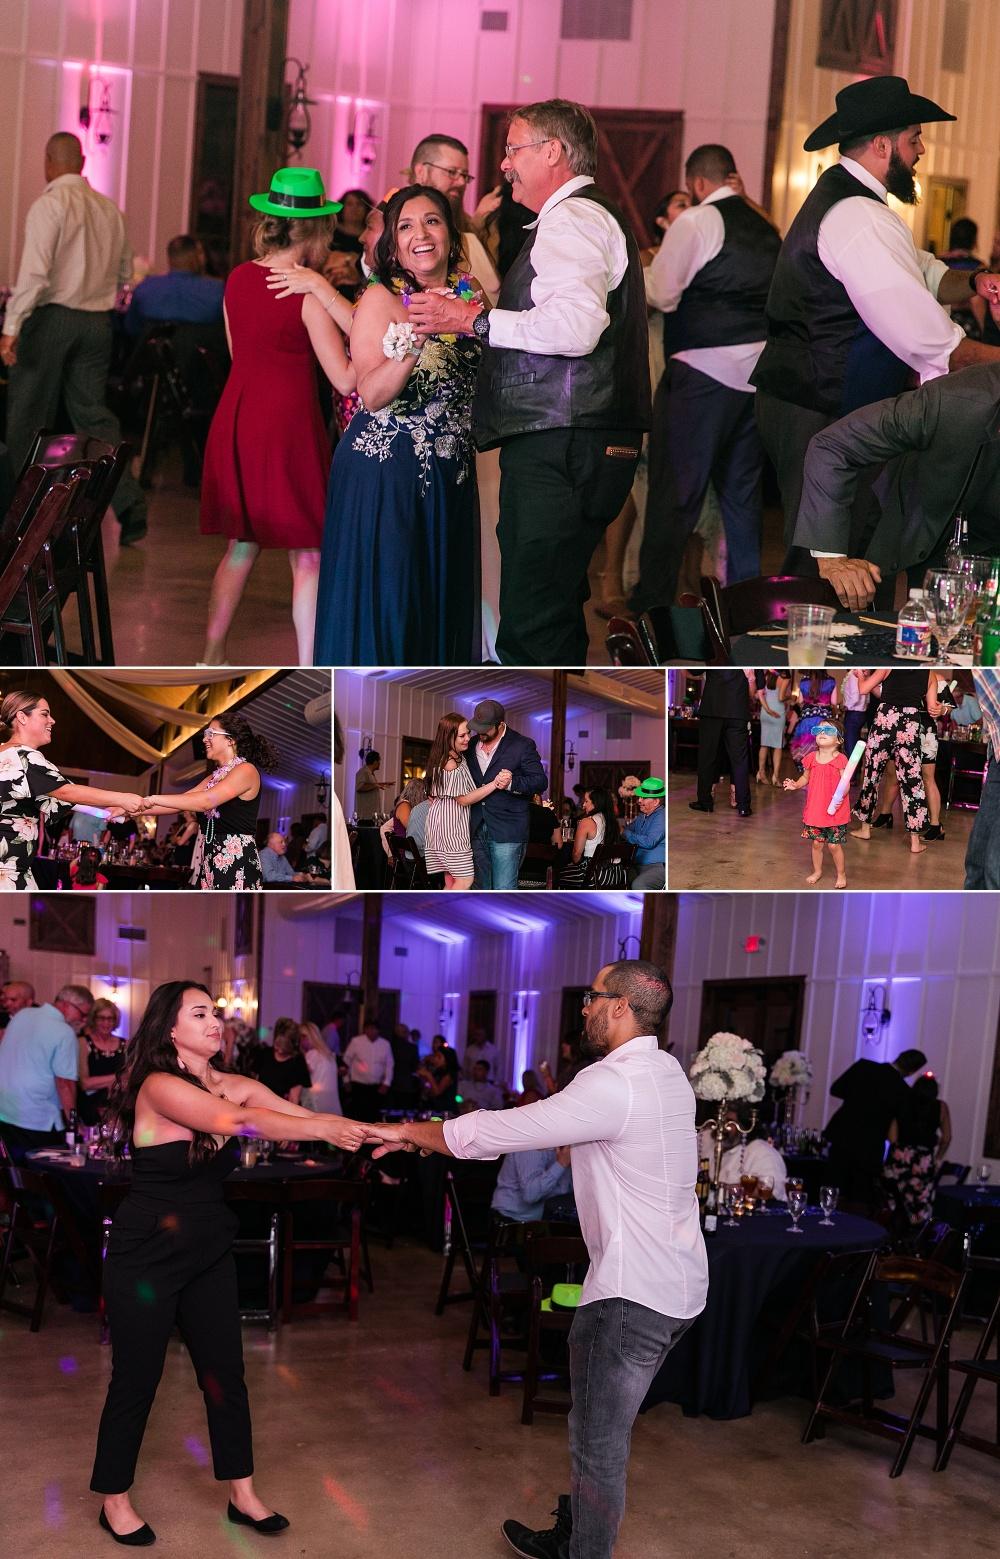 Wedding-Photographer-Bulverde-Texas-Western-Sky-Event-Venue-Carly-Barton-Photography_0064.jpg